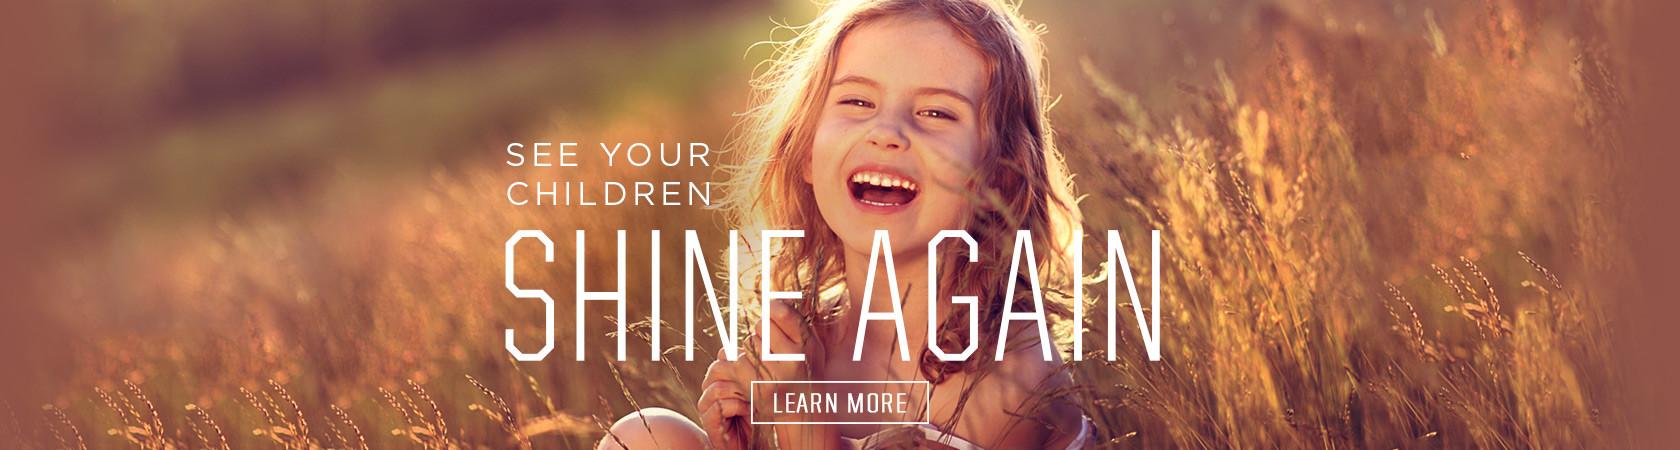 Home-Carousel-children-shine